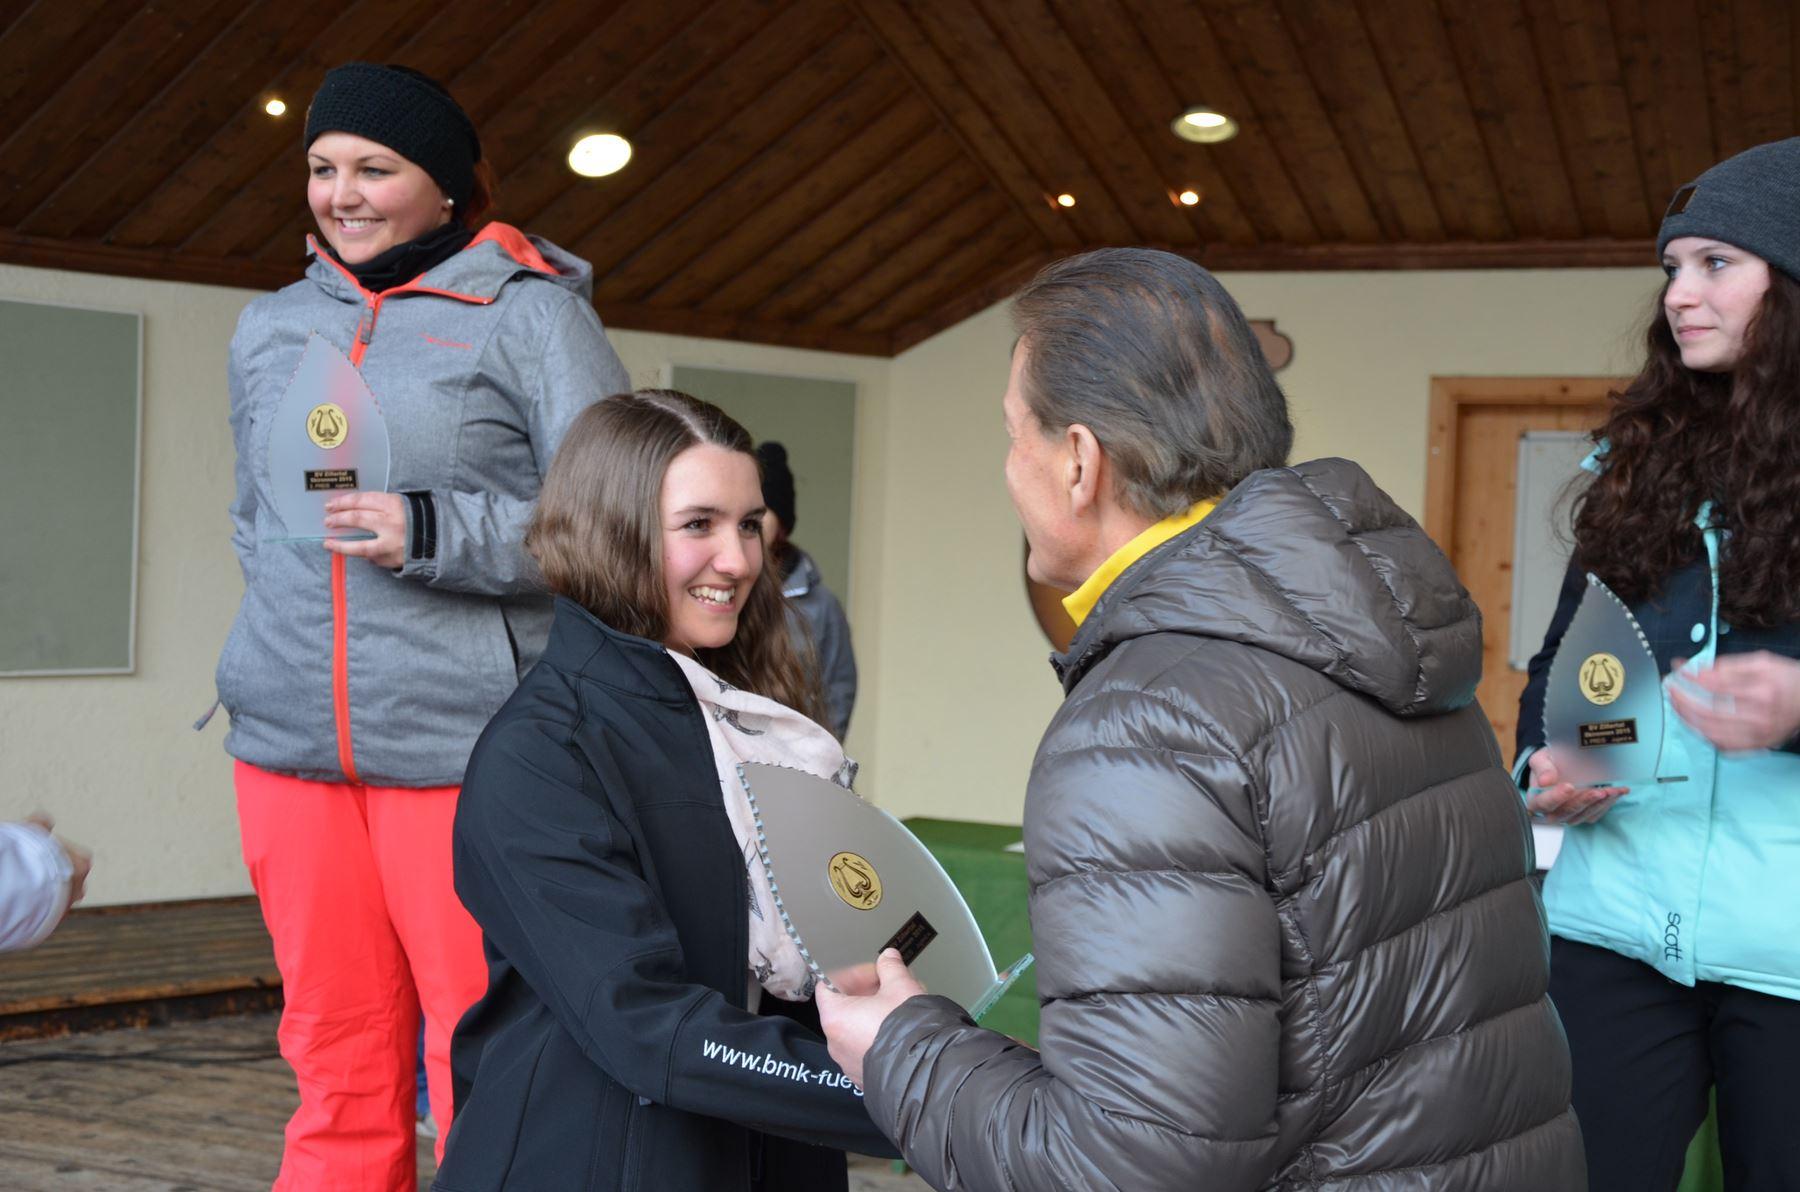 2015-03-22 BV Zillertal Skirennen 403.JPG